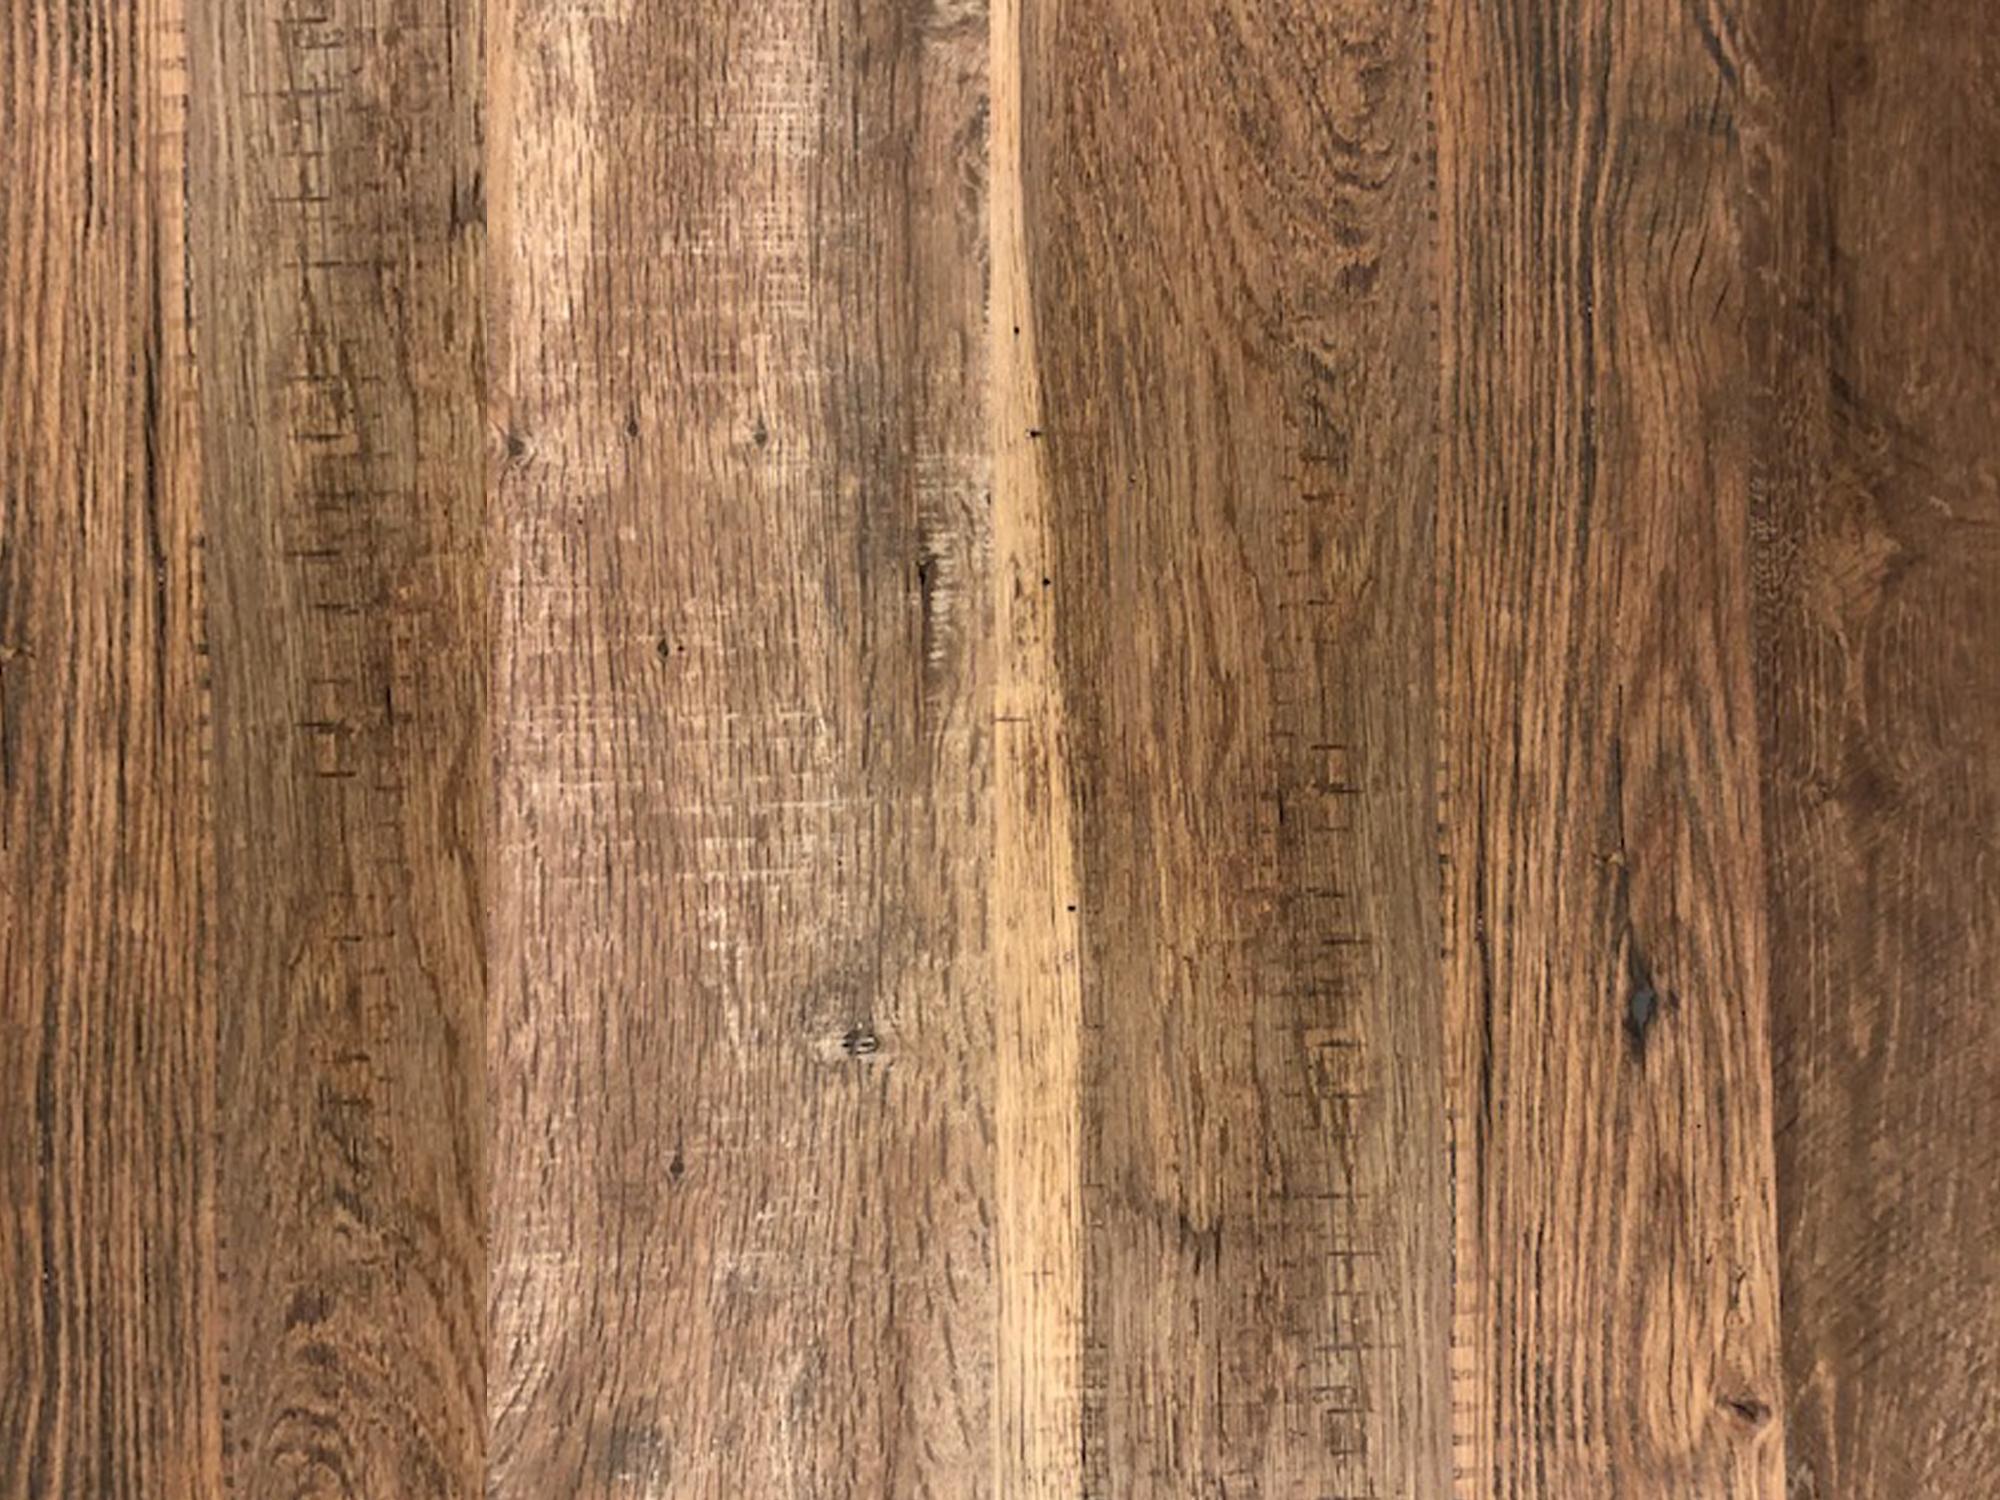 Barn oak wood sample